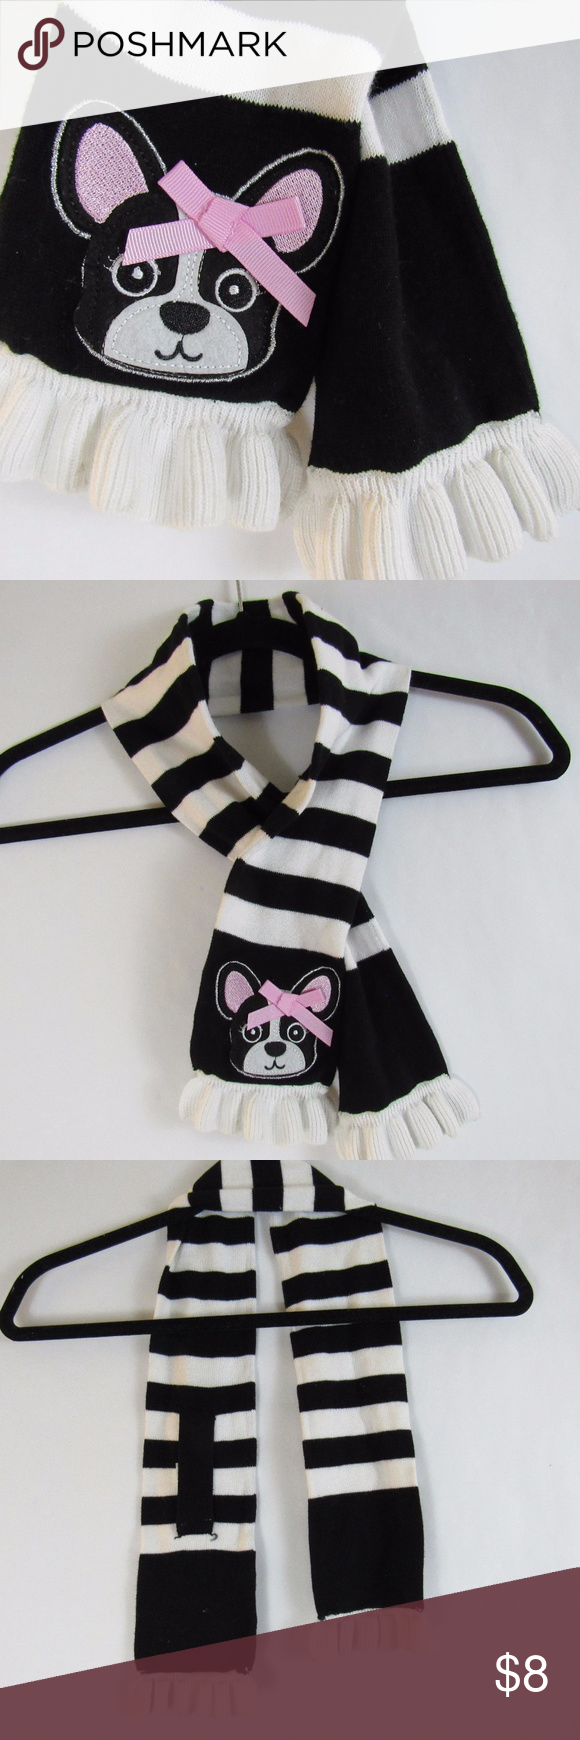 Black u white striped puppy scarf size pinterest